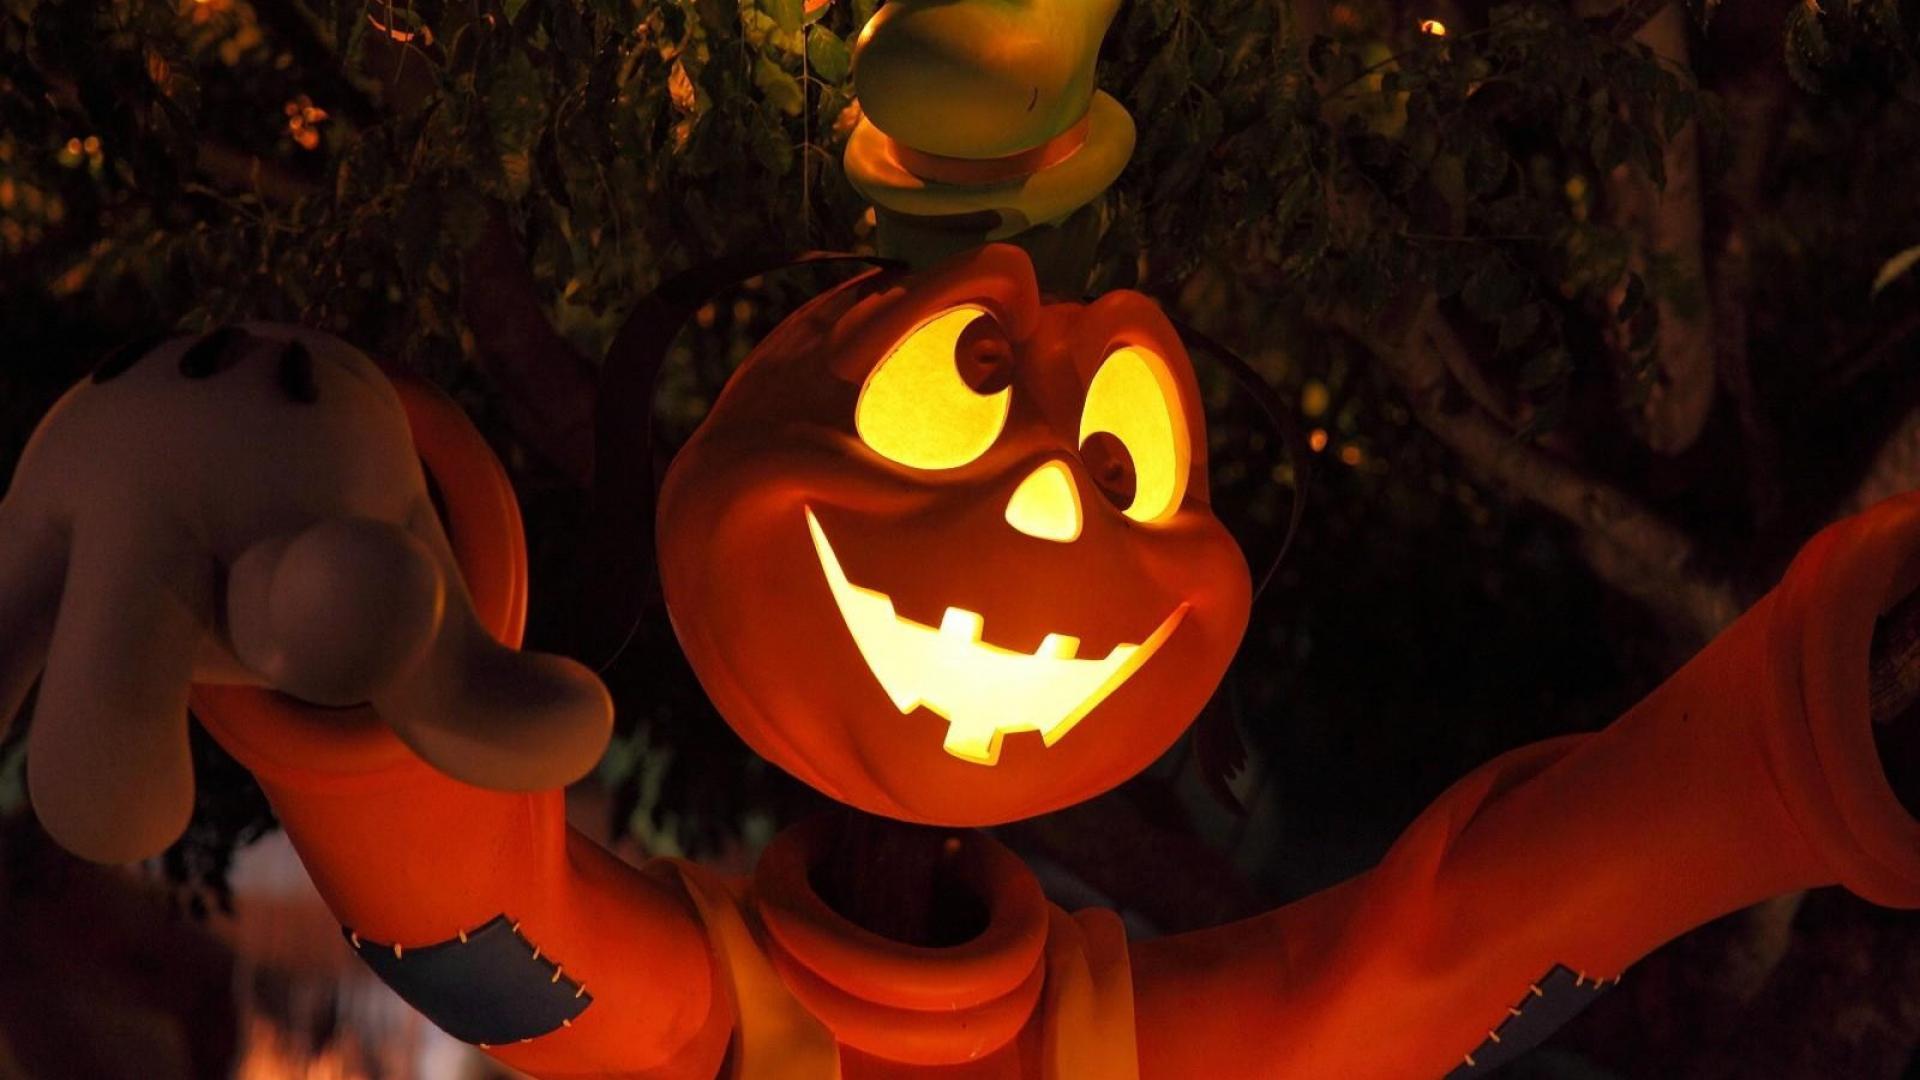 Animated Halloween Desktop Wallpaper Hd Hintergrundbilder Halloween Cartoon Baum Licht Augen